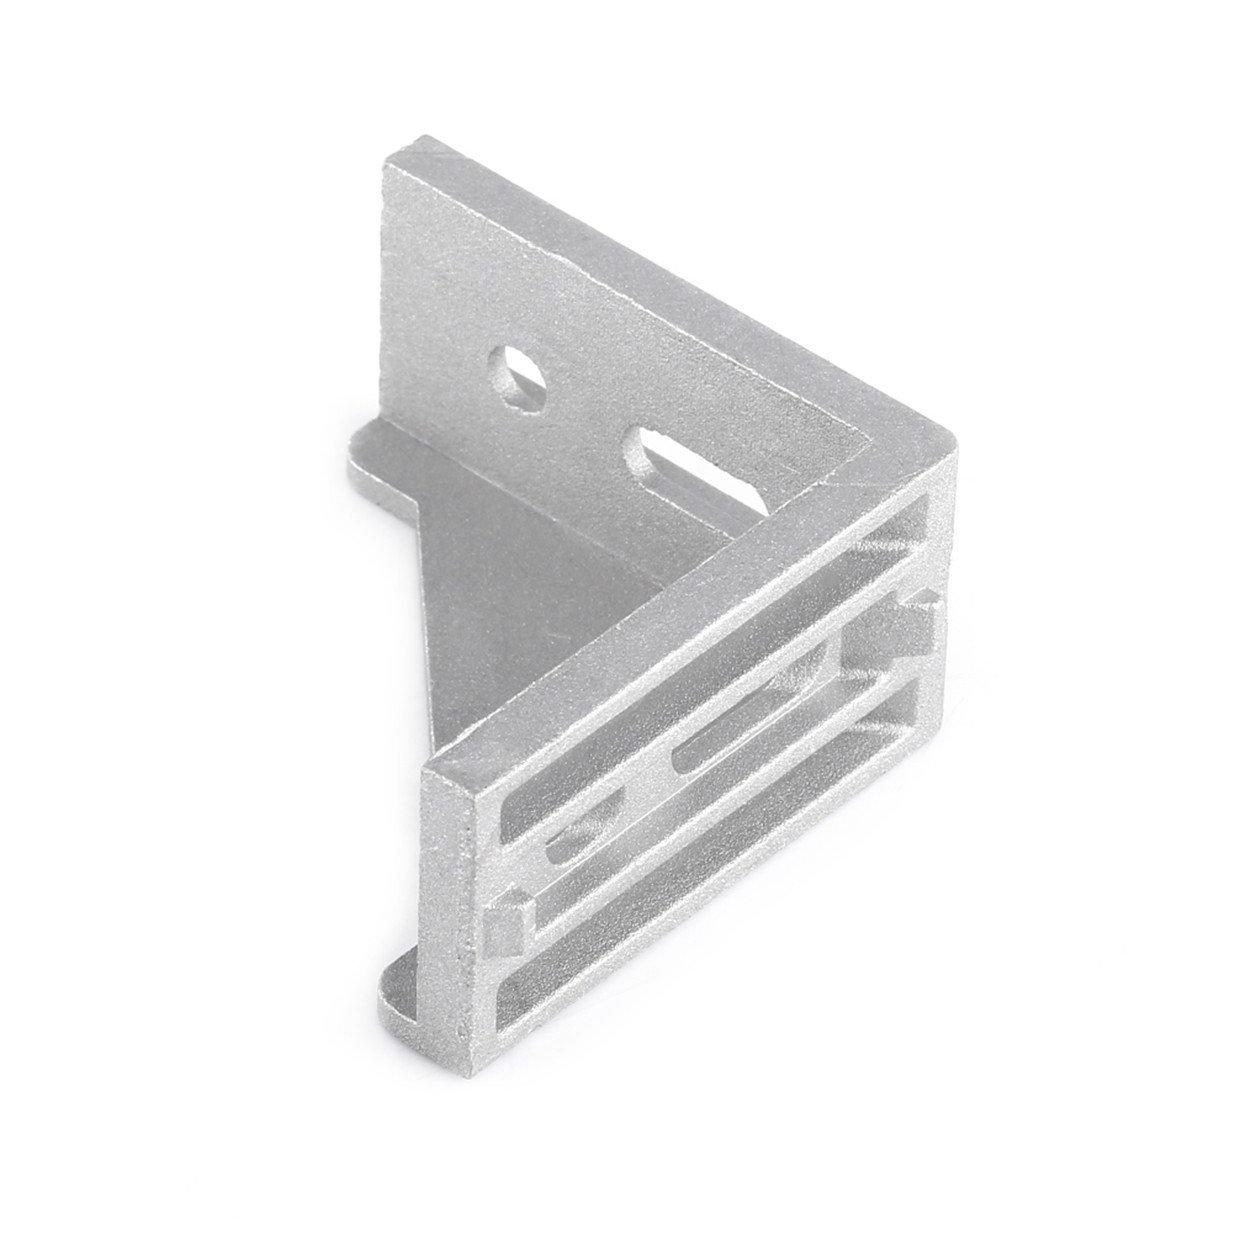 Eckwinkel 2020 Aluminium 10 St U Ck 20 X 20 X 17 Mm L F O Rmig